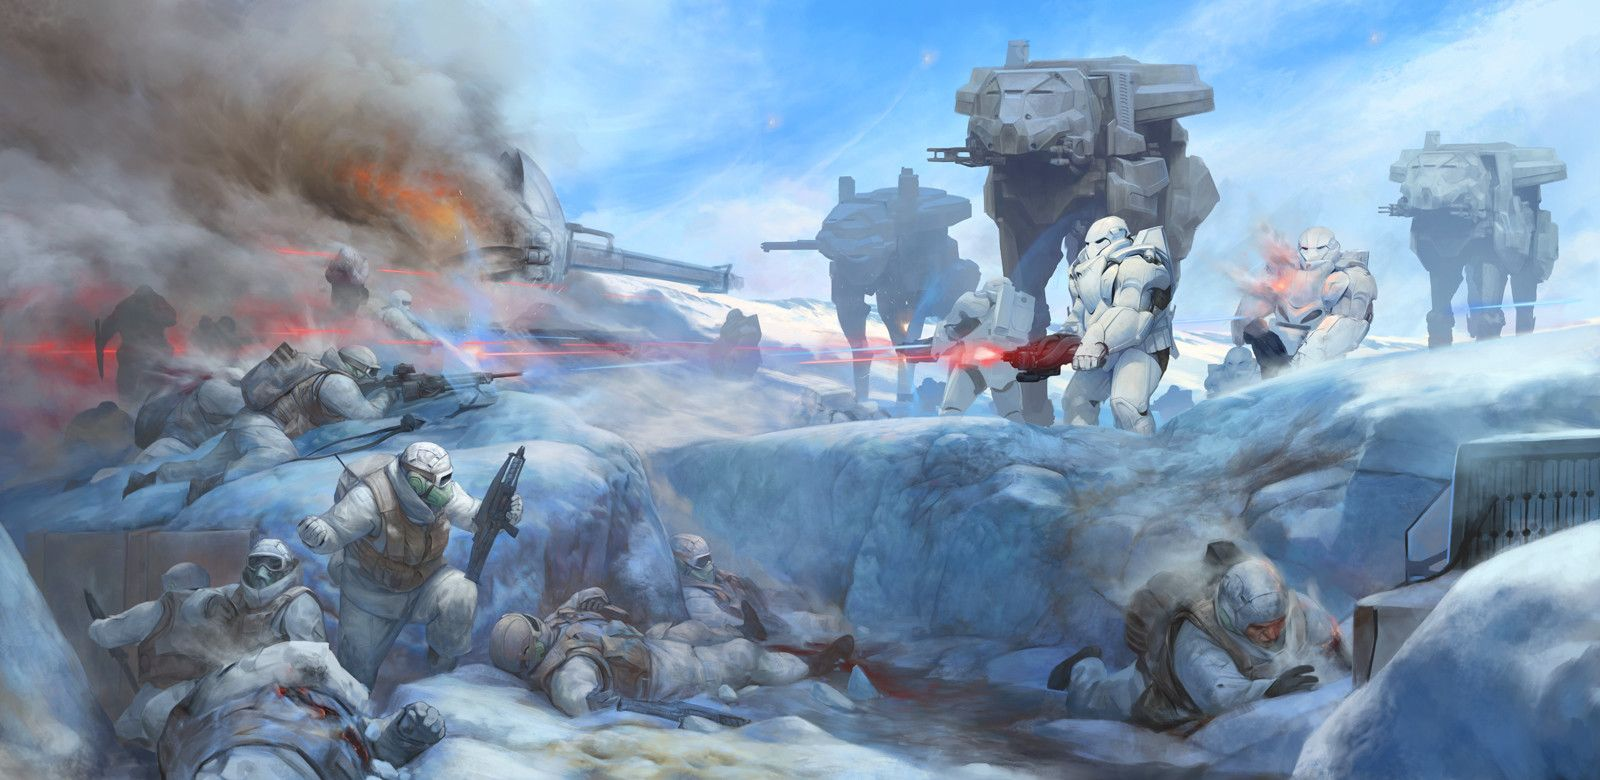 Battle on planet Hoth, Stepan Alekseev on ArtStation at https://www.artstation.com/artwork/rOXn5